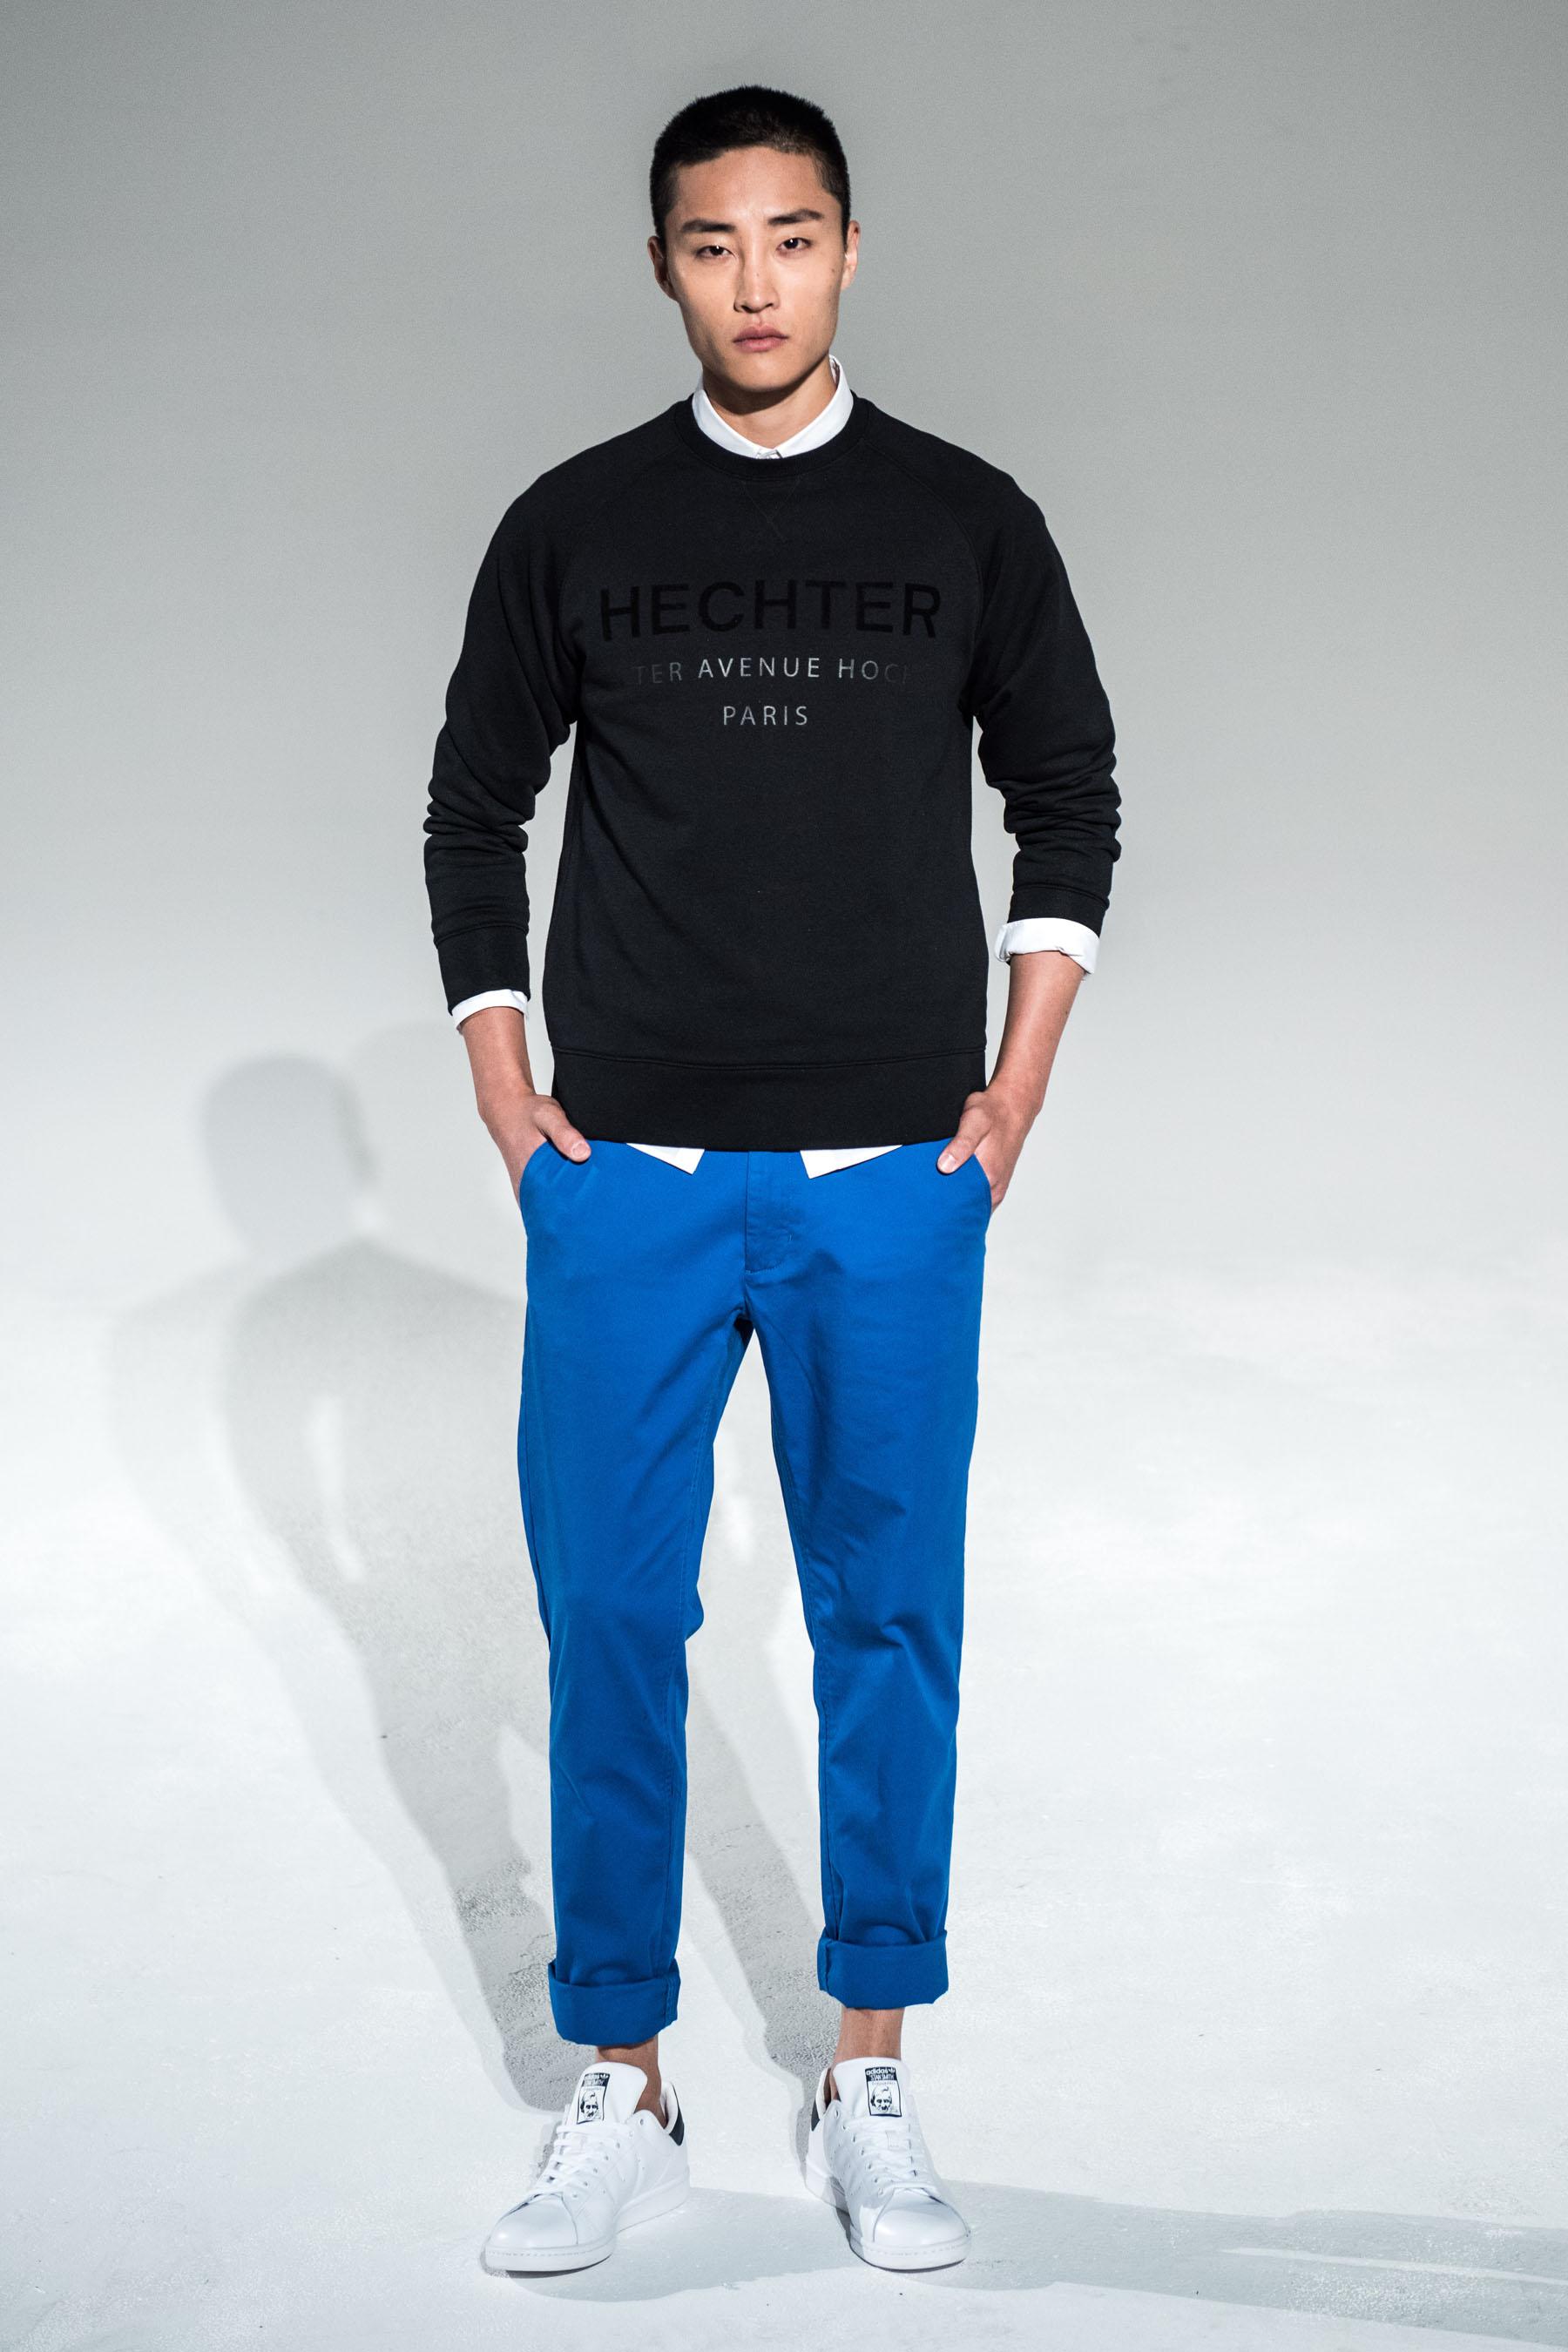 Men's Fashion Trends For 2018 FashionBeans 28